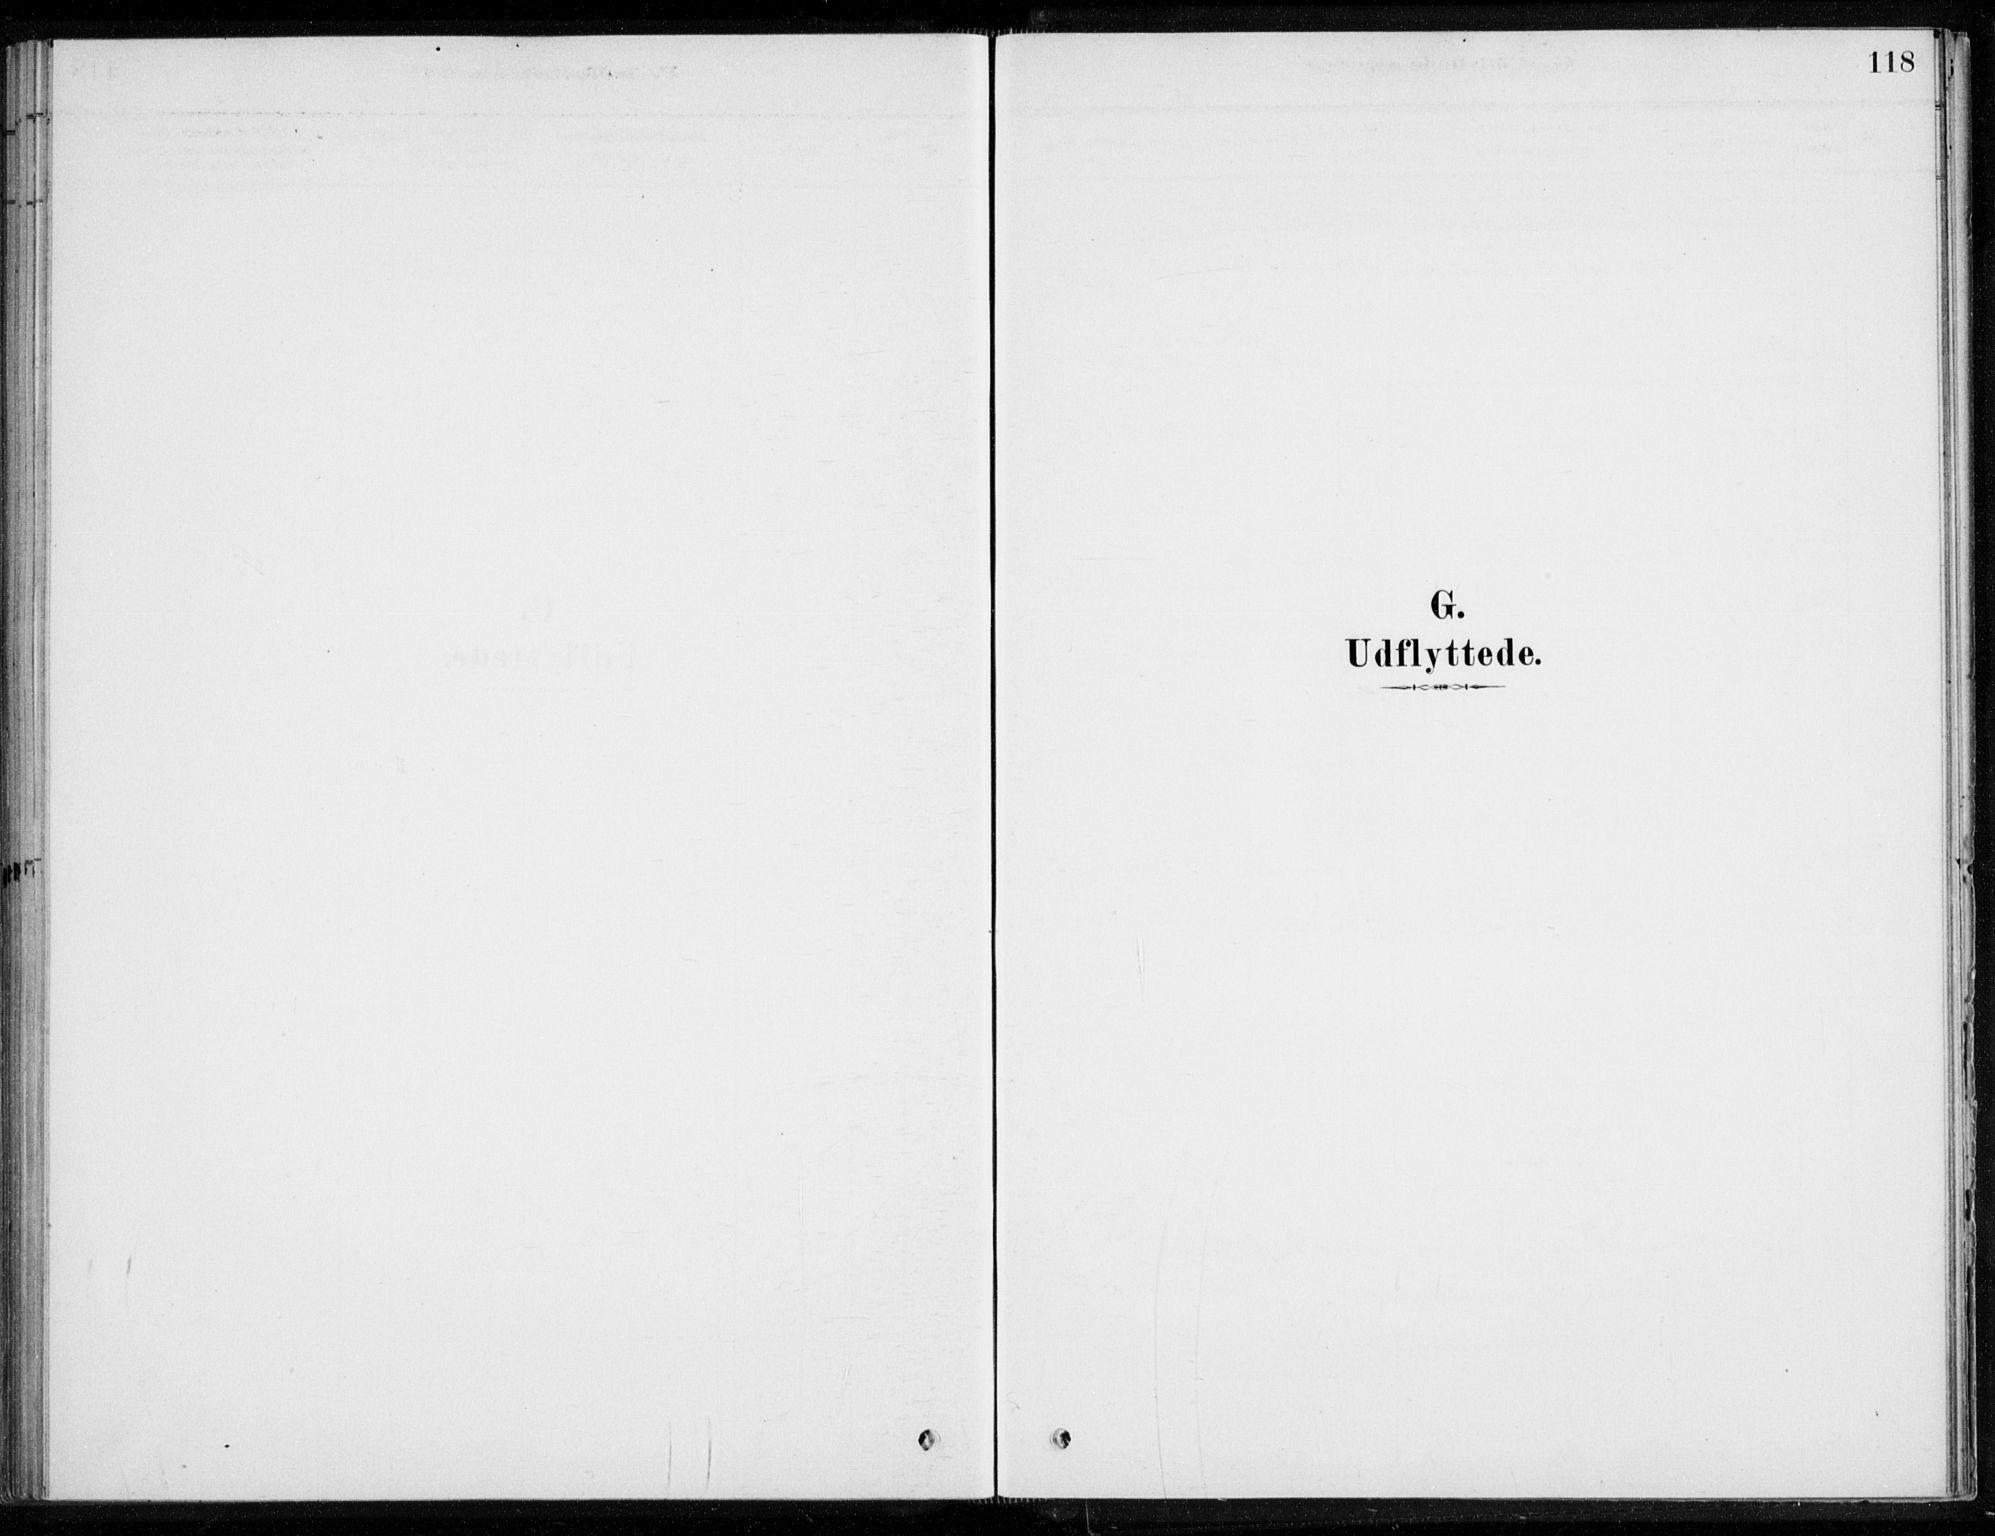 SAKO, Åssiden kirkebøker, F/Fa/L0001: Parish register (official) no. 1, 1878-1904, p. 118